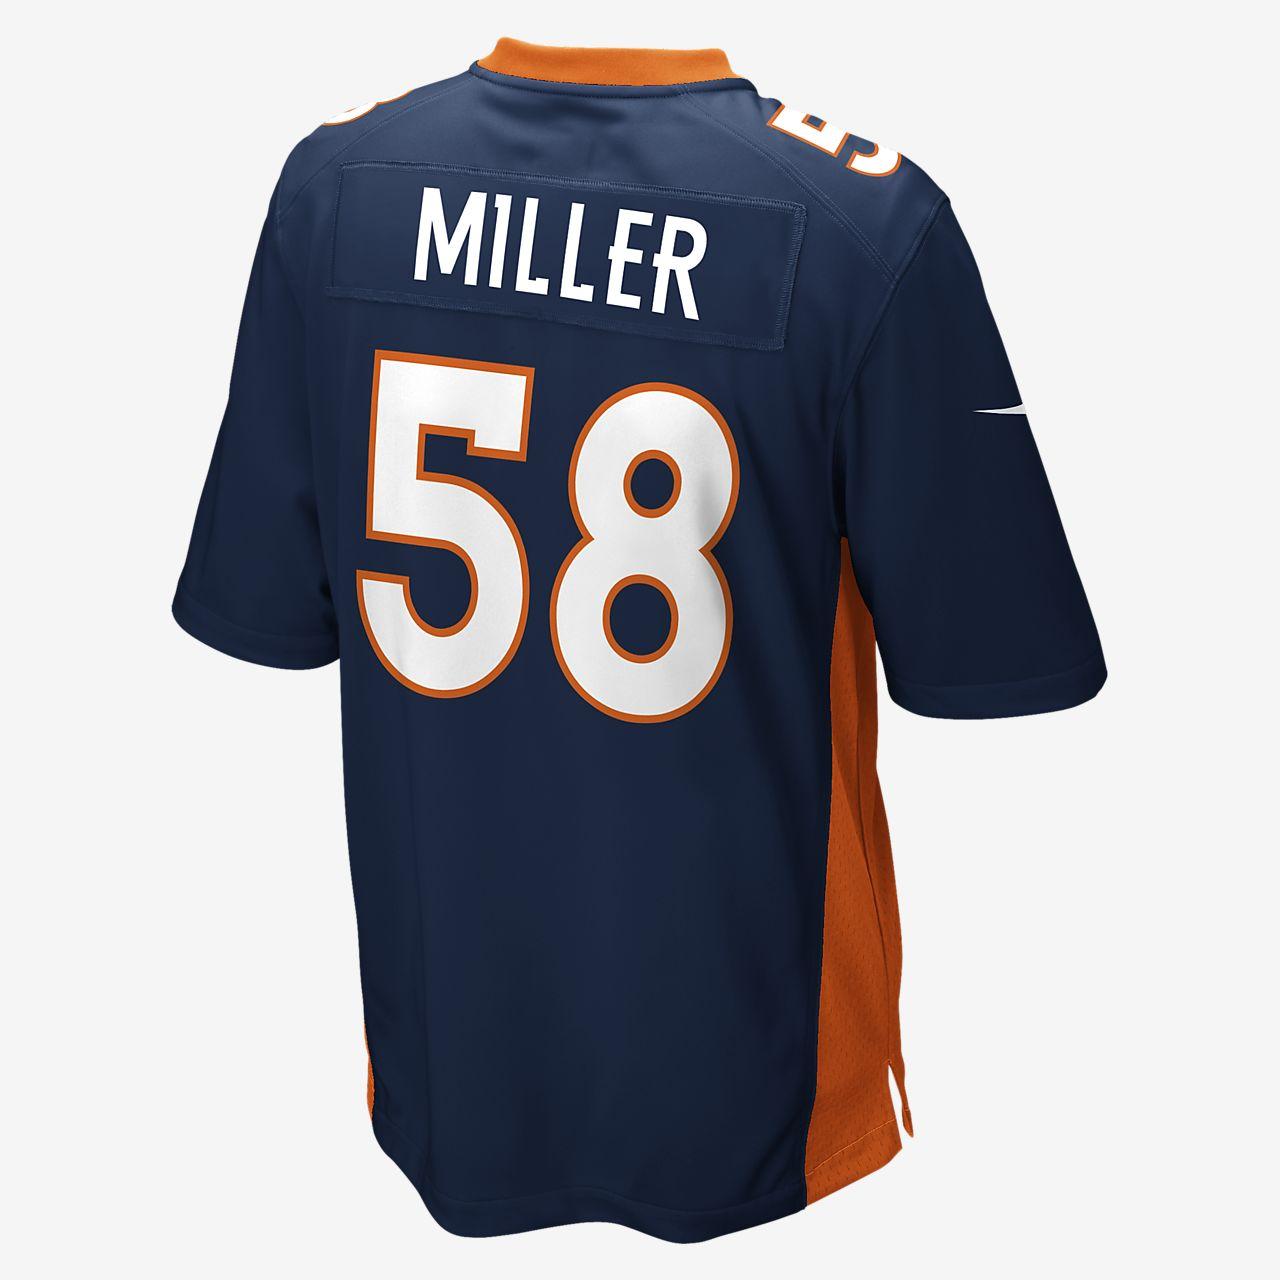 a8b1036895b NFL Denver Broncos (Von Miller) Men's Game Football Jersey. Nike.com